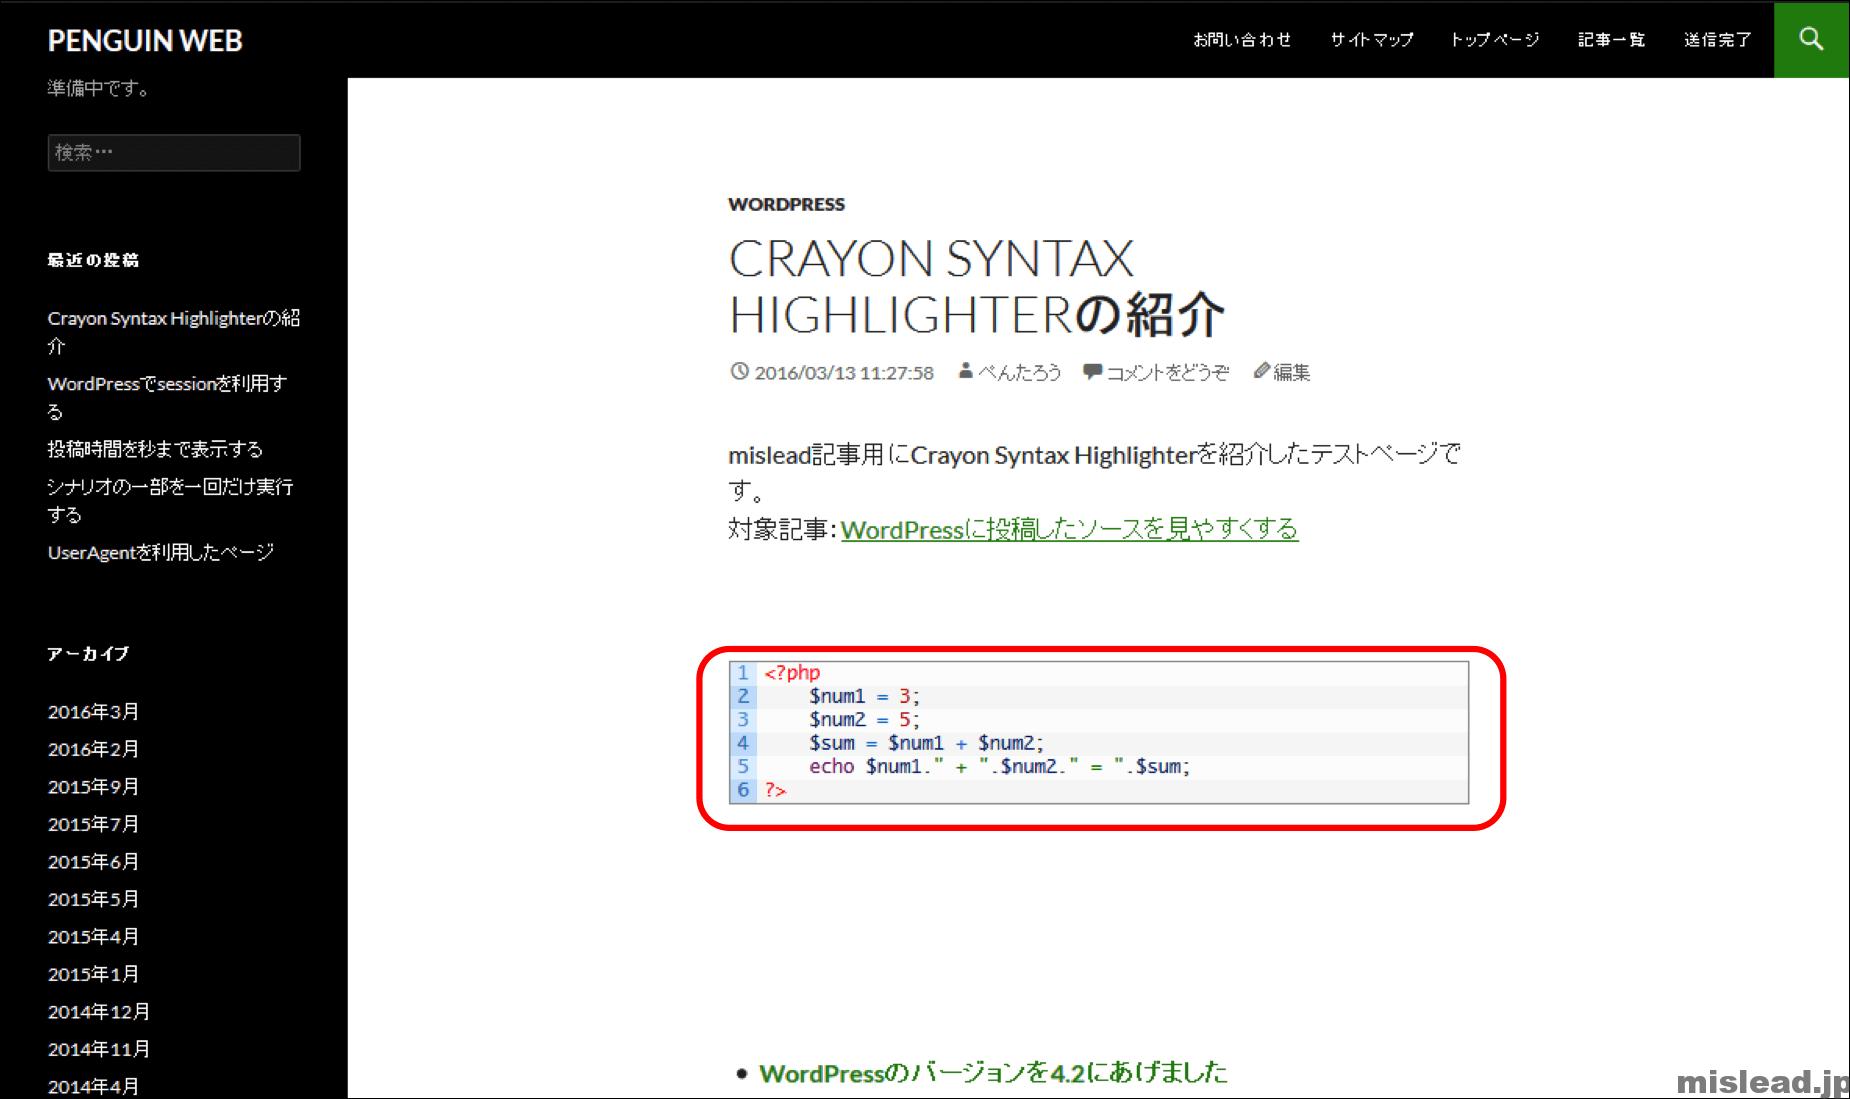 Crayon Syntax Highlighterの反映